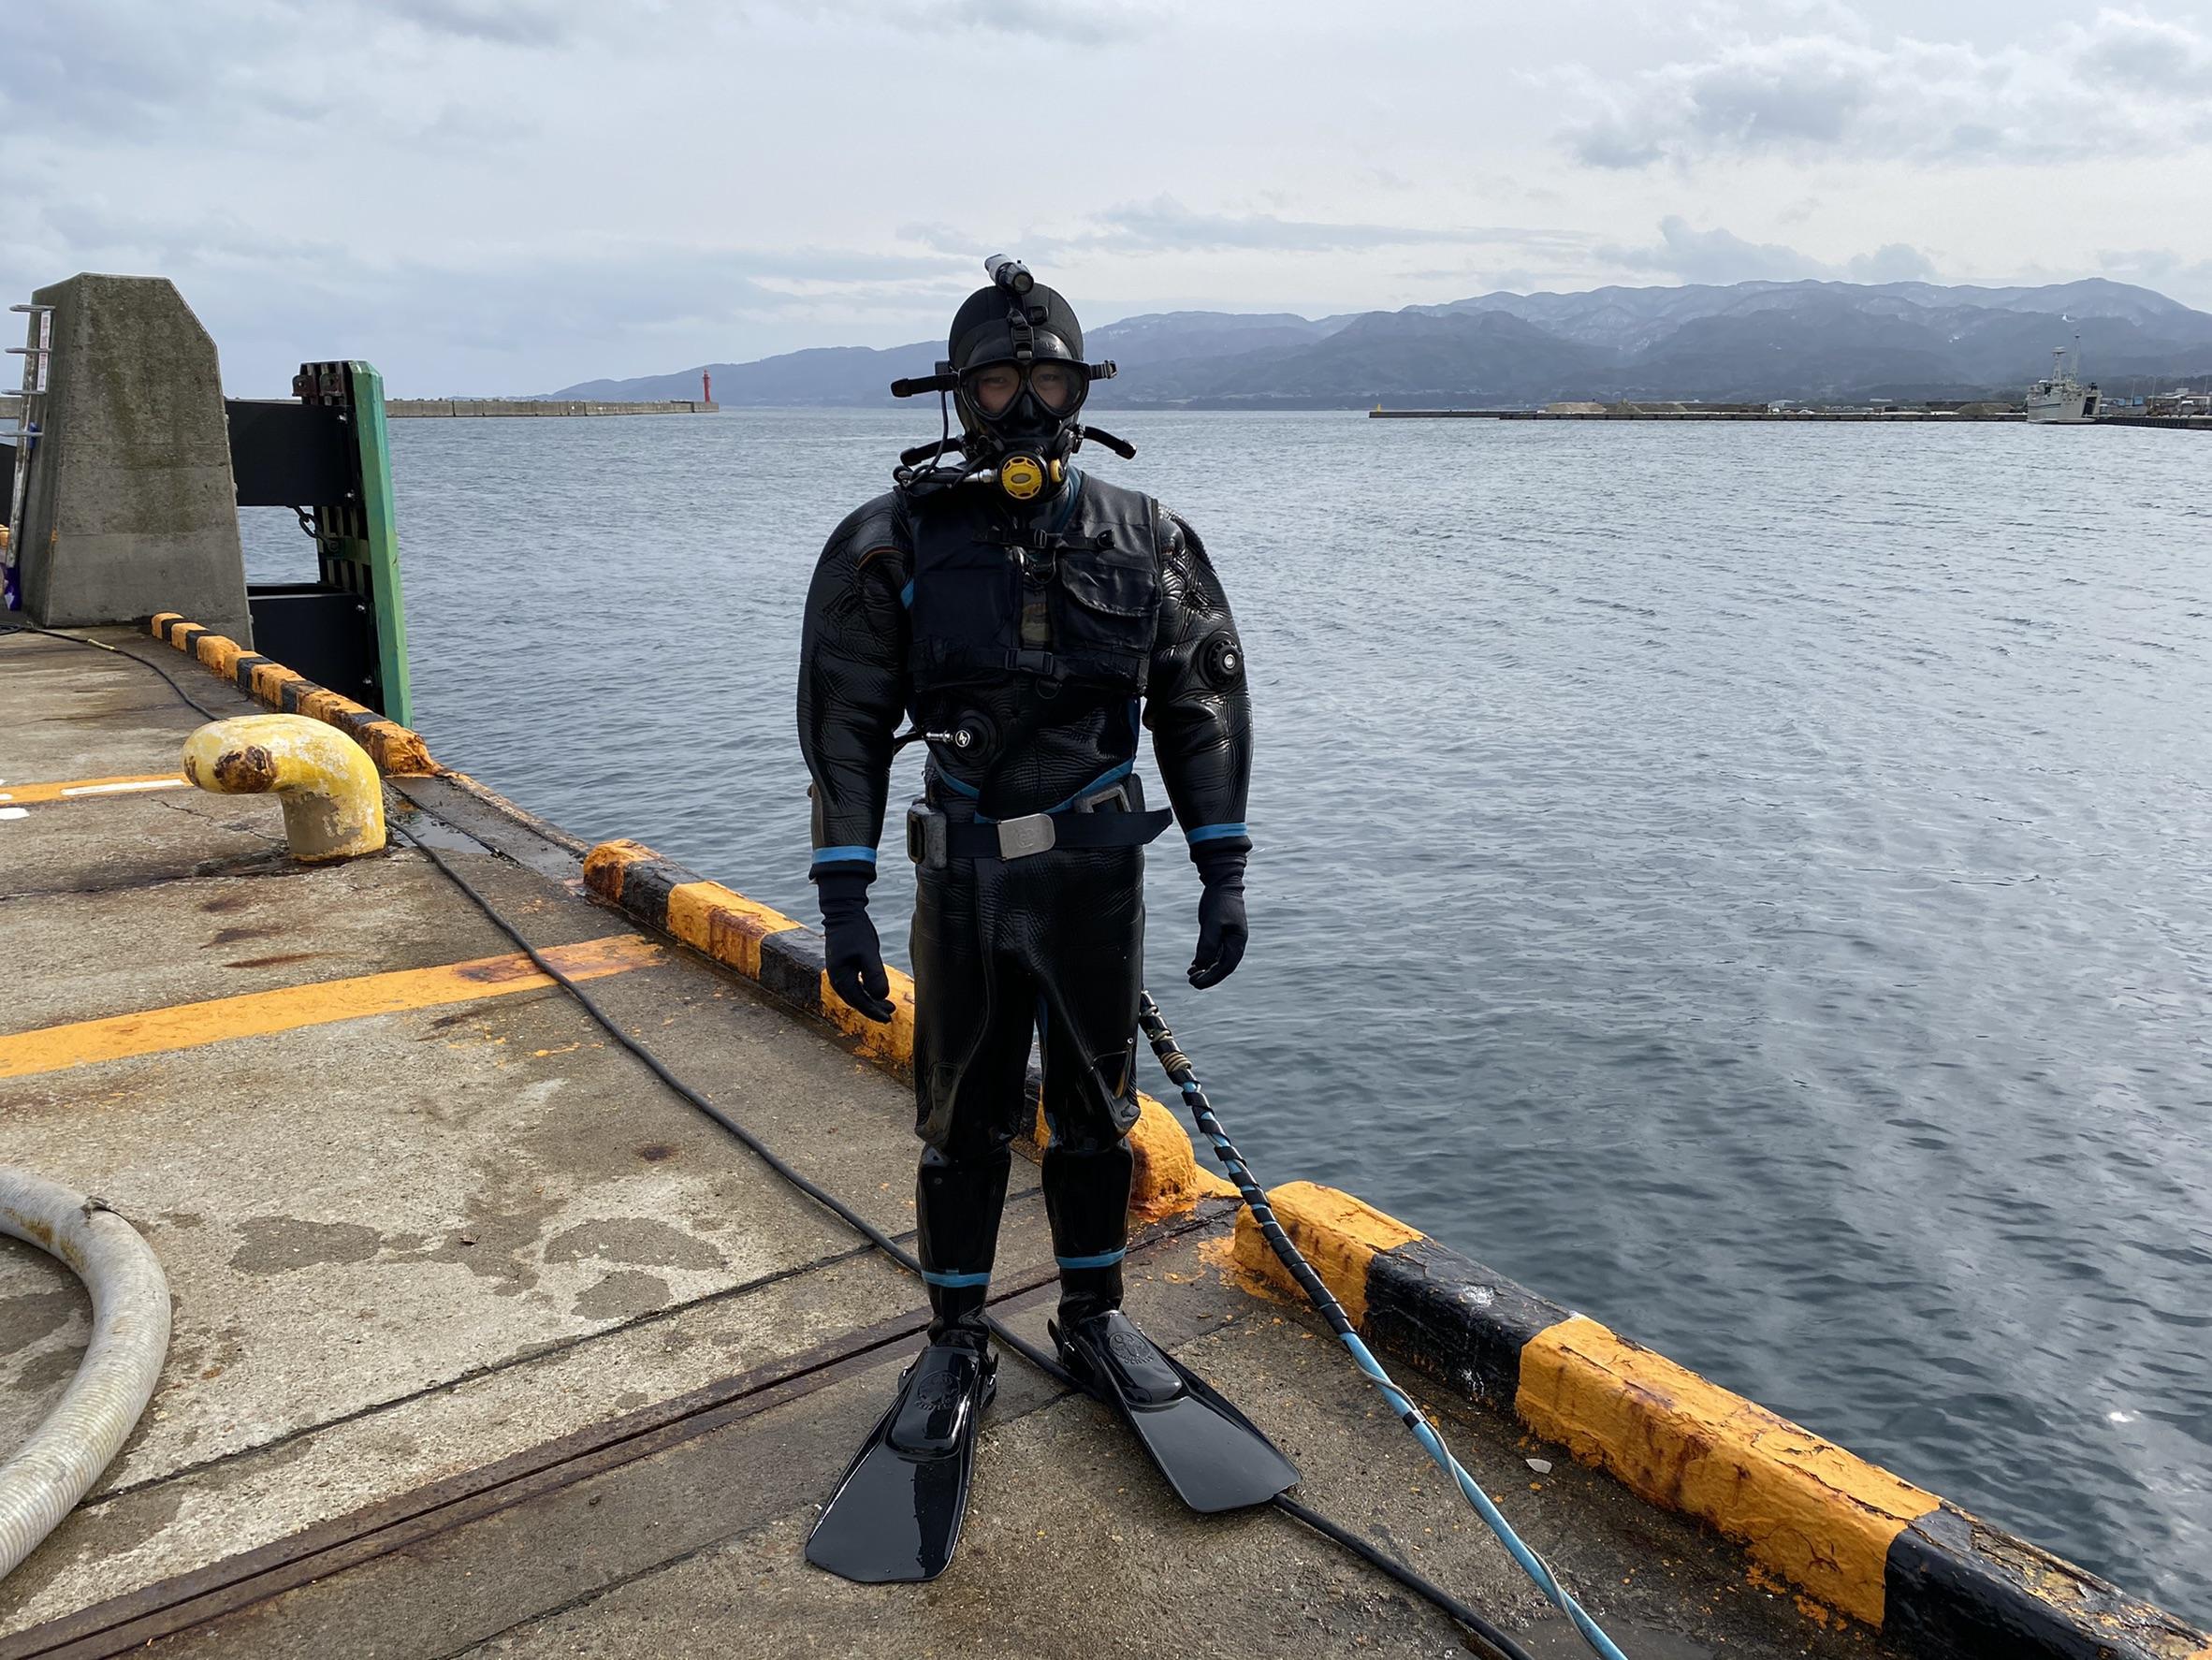 水中作業・水際作業は新潟潜水興業株式会社へ